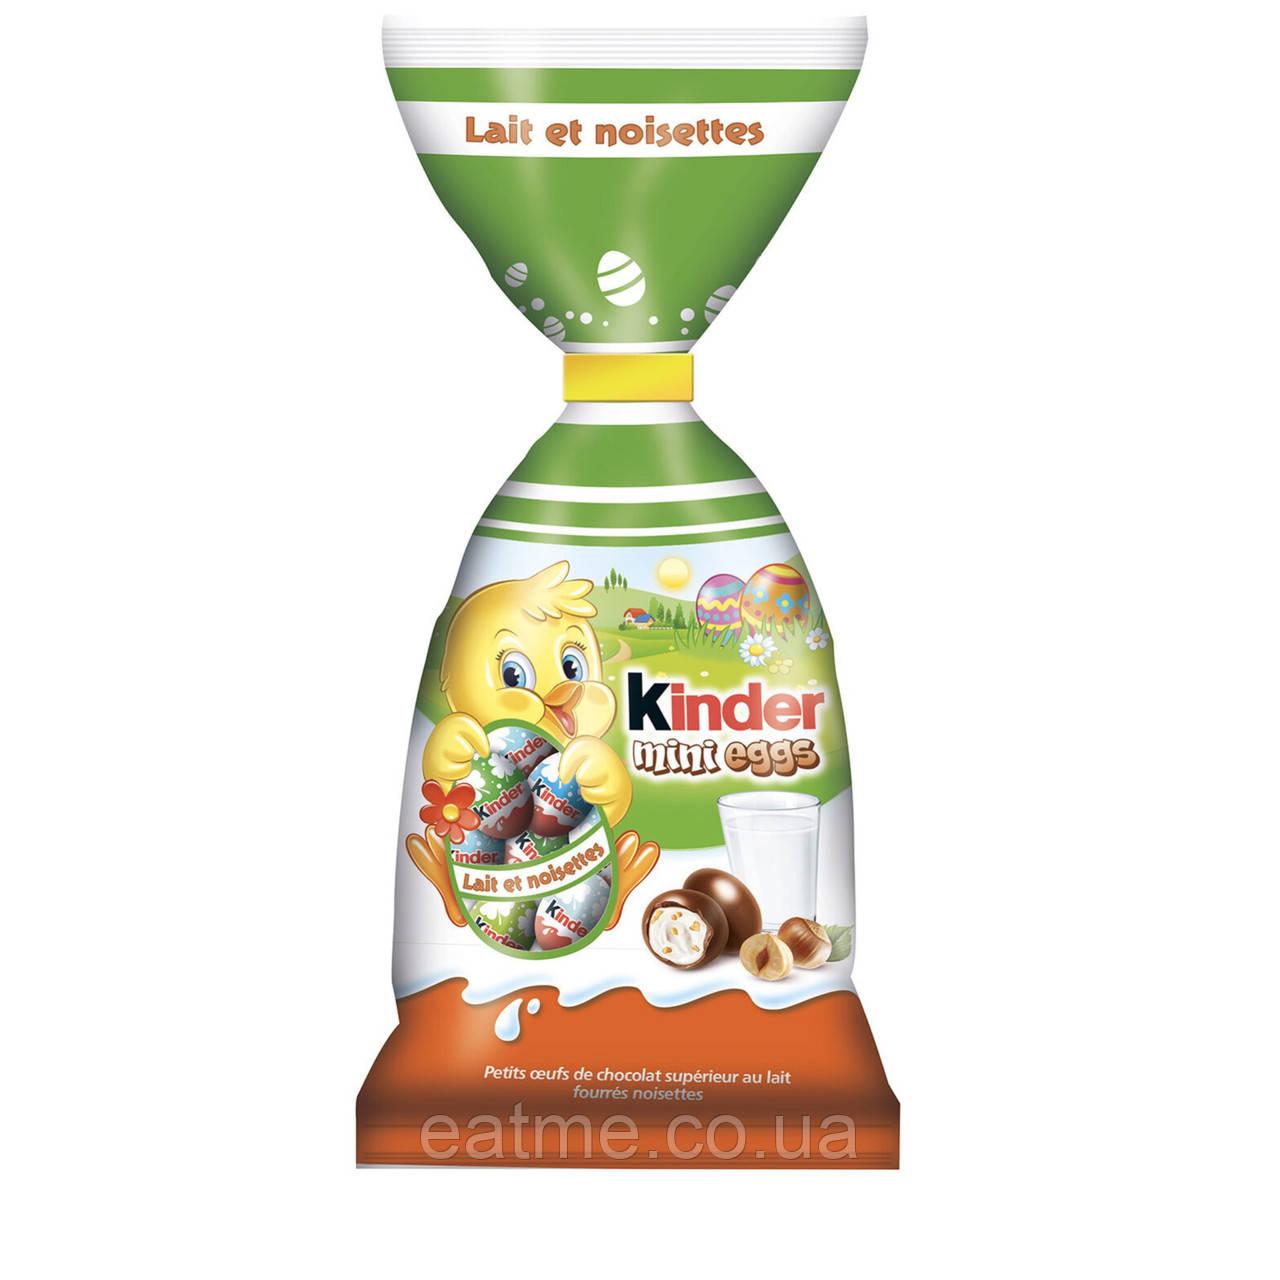 Kinder mini eggs Мини яйца из молочного шоколада с молочной начинкой и дроблённым фундуком